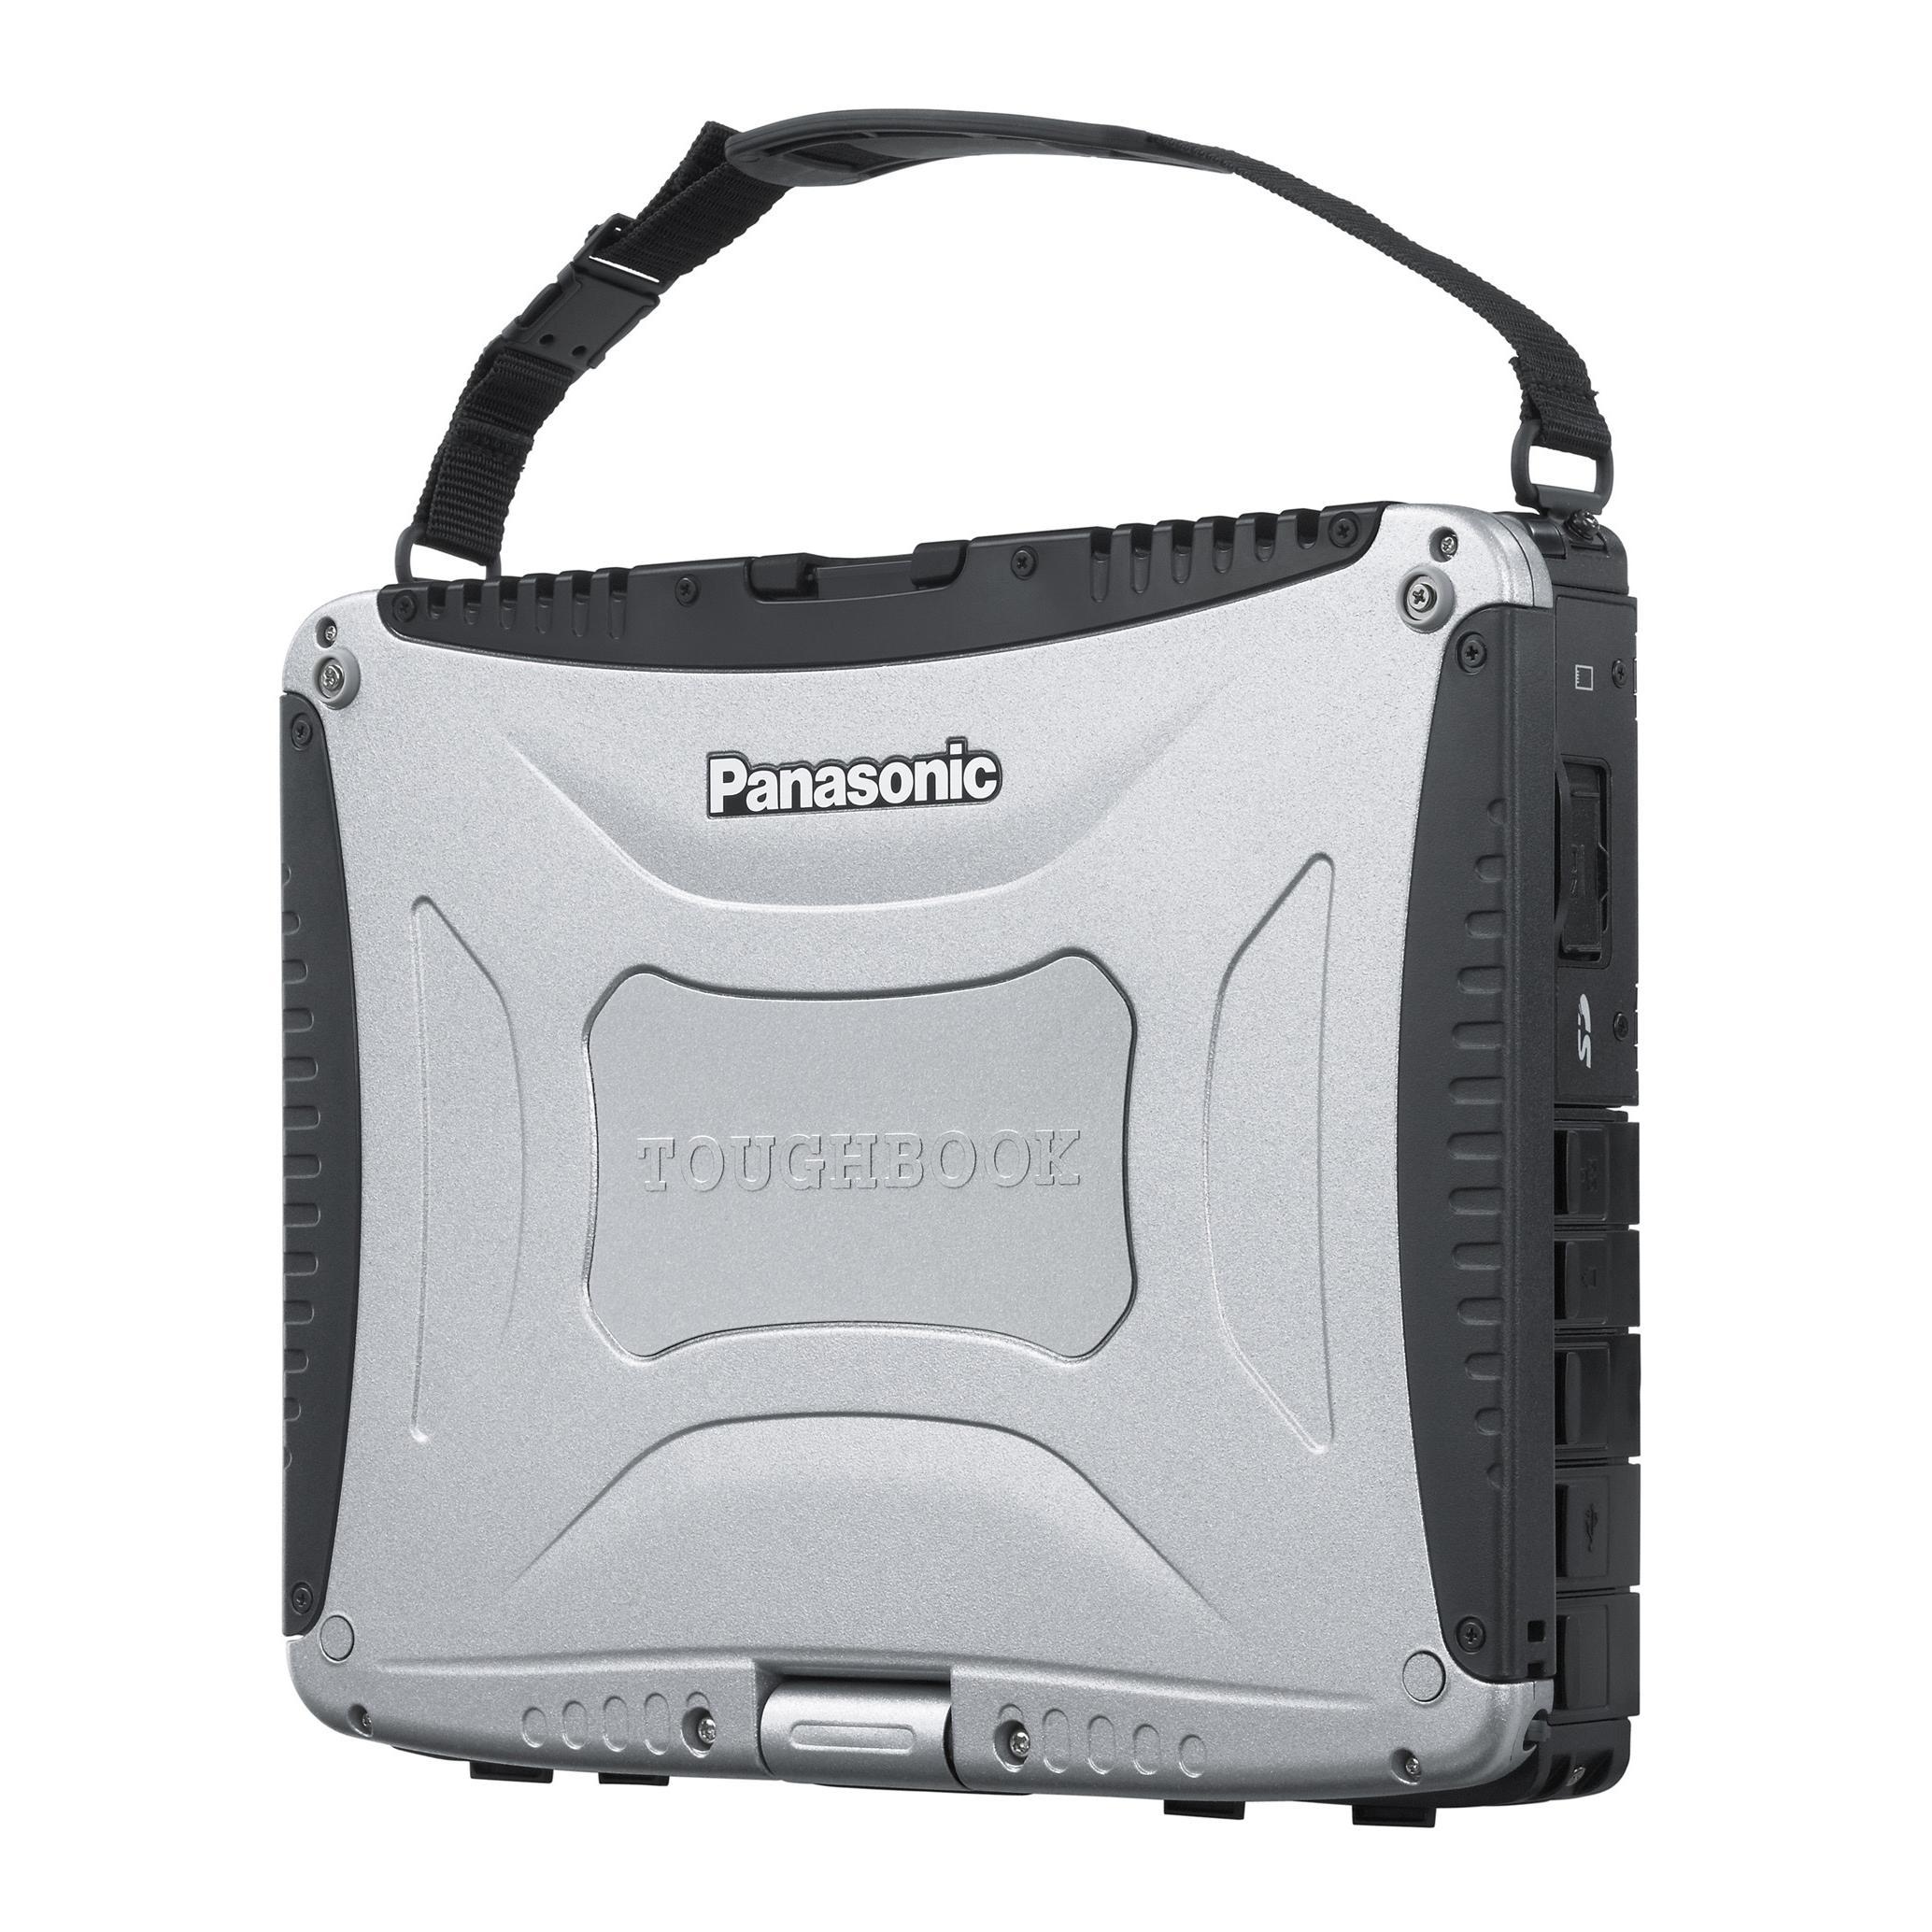 Panasonic CF-19 MK1 - U2400 Ultra Low Voltage 1,06 GHz - HDD 160 Go - RAM 2,5 Go - AZERTY